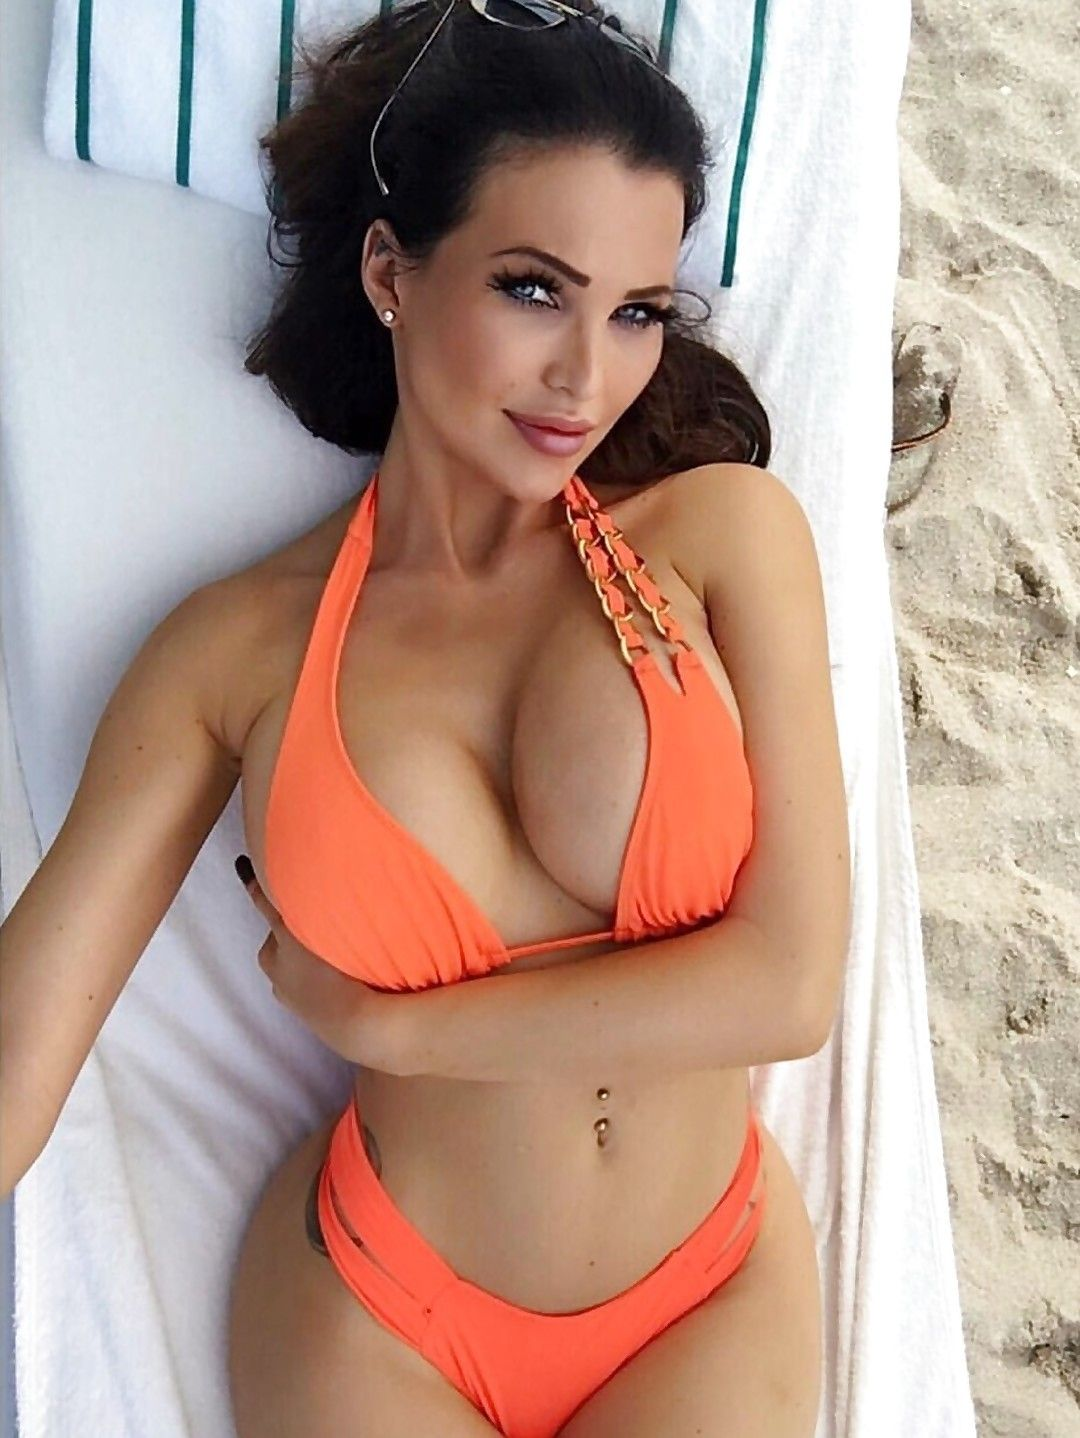 Bikini Helen de Muro nude (62 photo), Topless